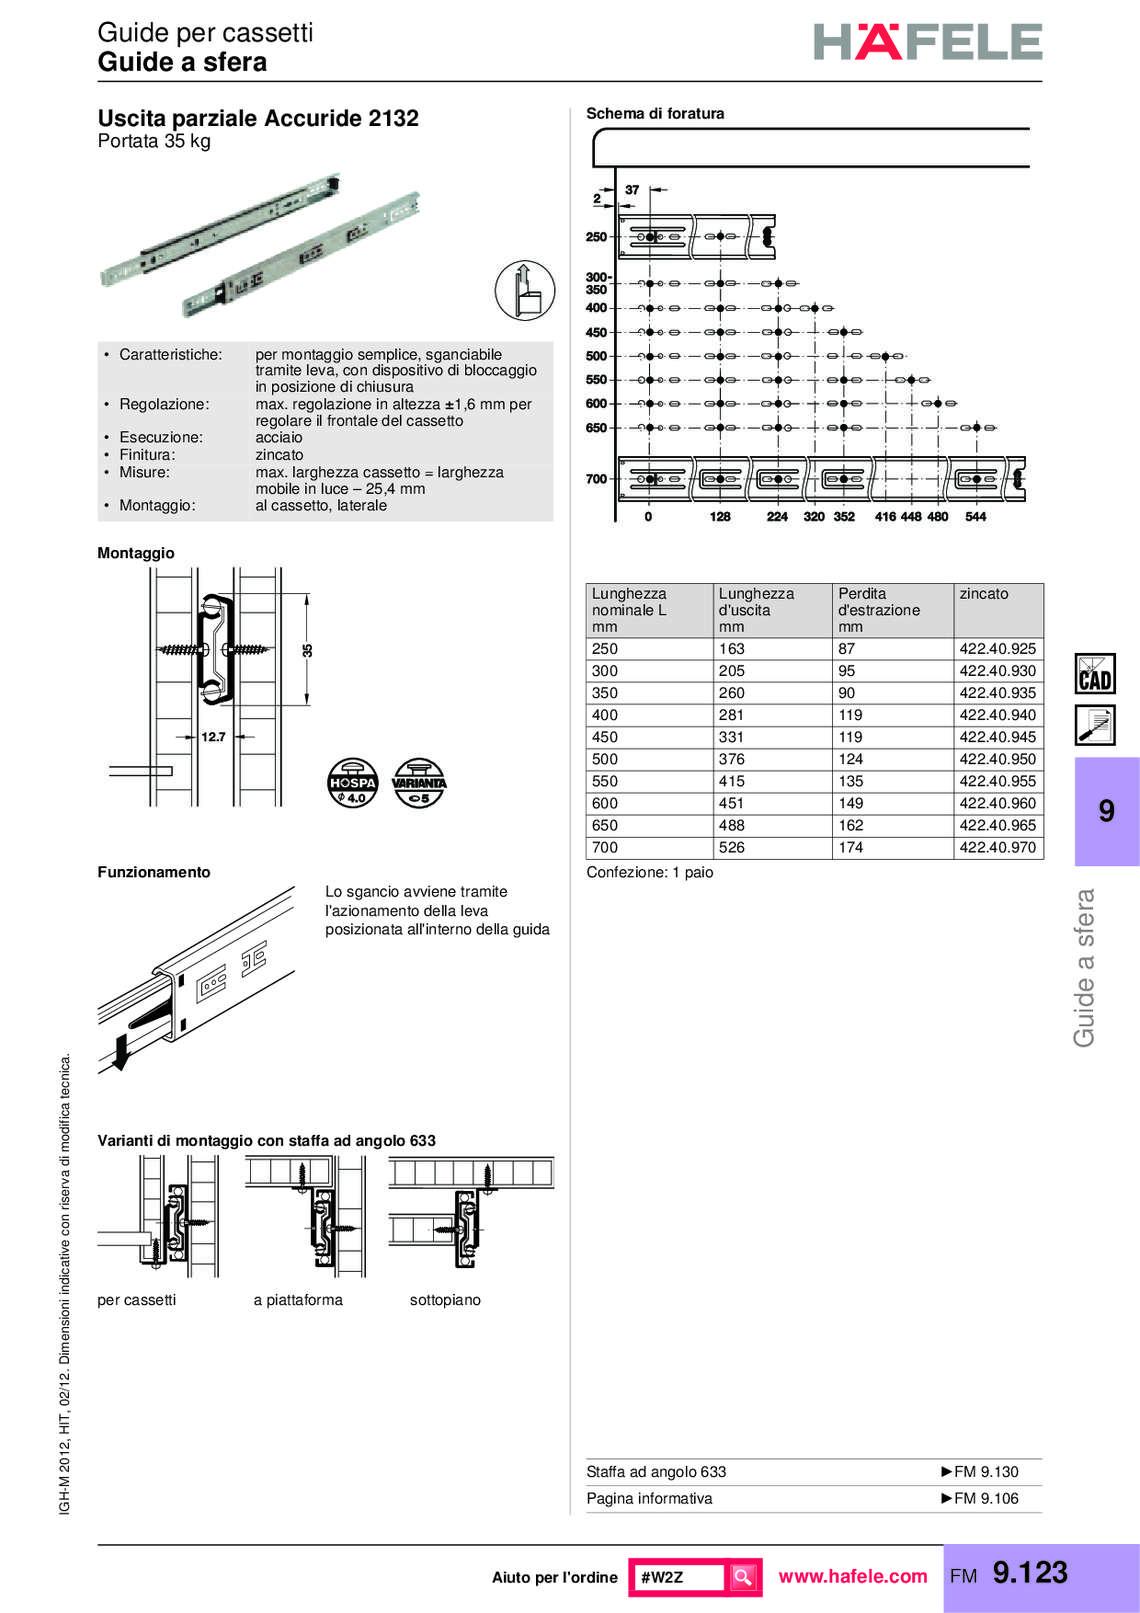 hafele-spondine-e-guide-per-mobili_40_176.jpg